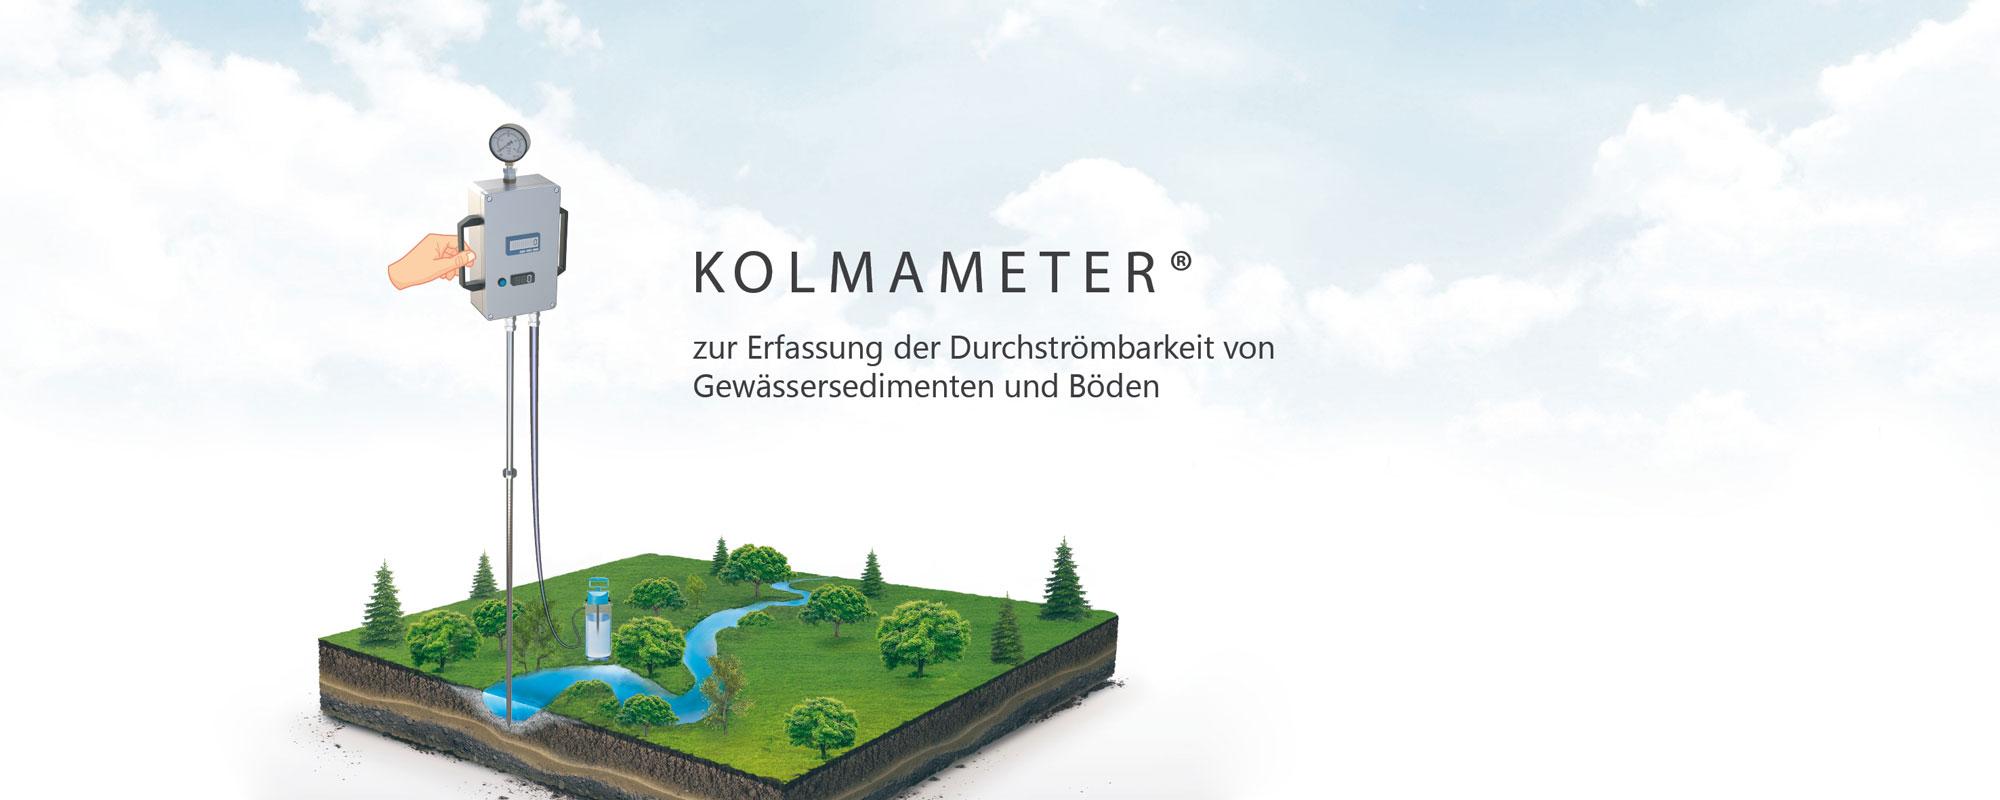 Kolmation und Kolmameter®